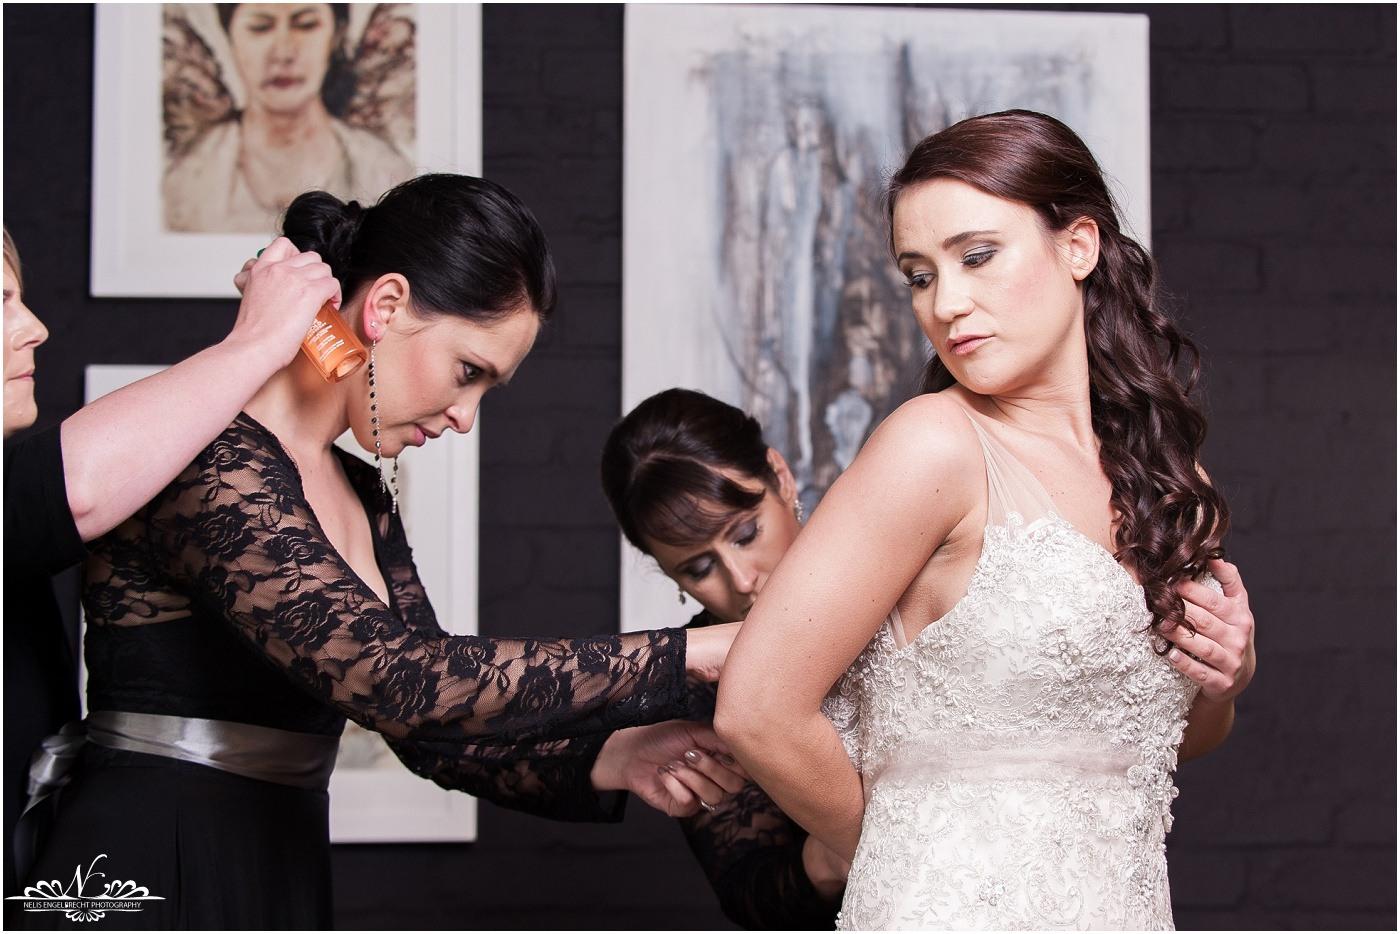 Eensgezind-Wedding-Photos-Nelis-Engelbrecht-Photography-030